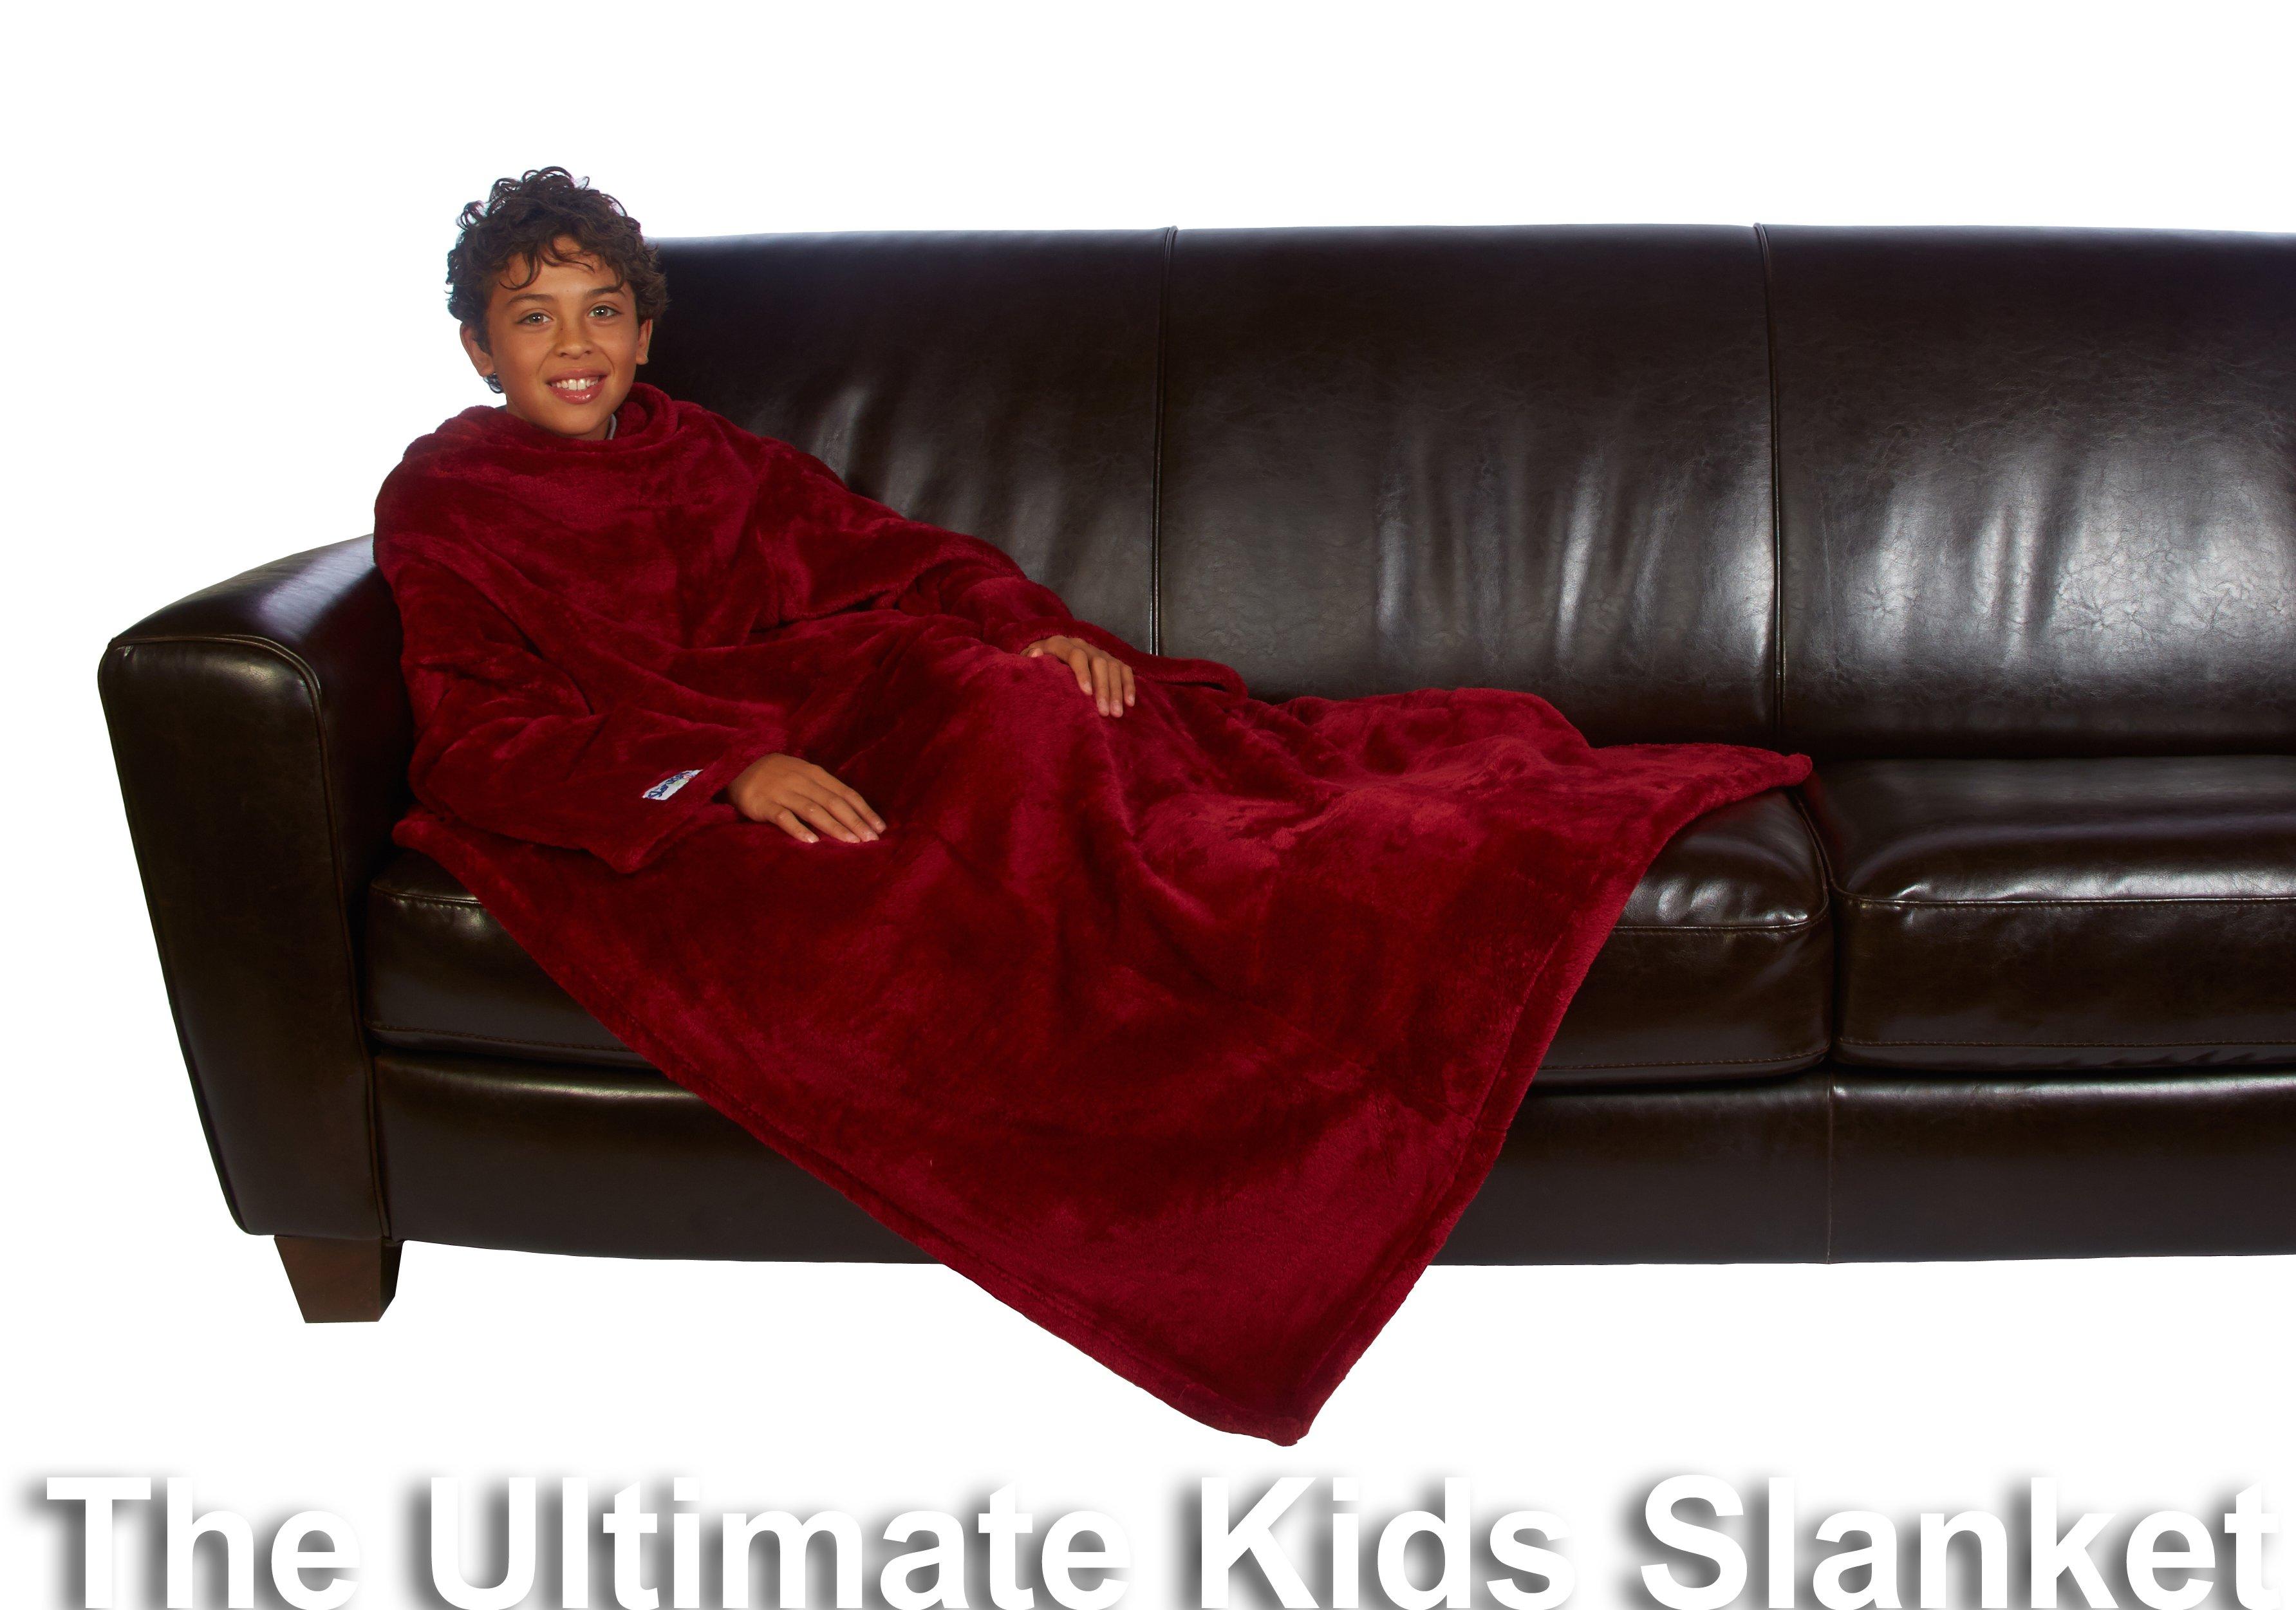 Coperta Con Maniche Slanket.The Slanket The Original Blanket With Sleeves Home